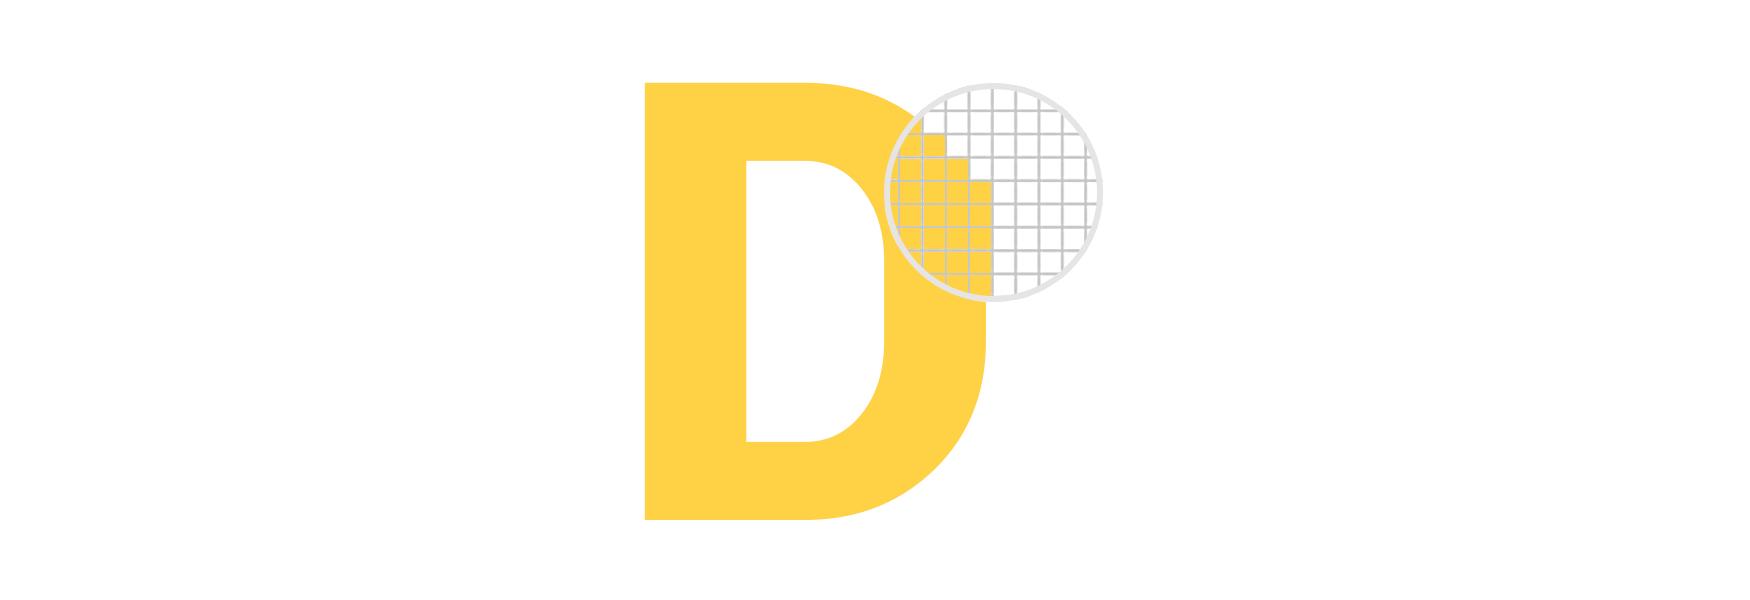 Designagentur-Stuttgart-Kreativbetrieb-Design-Lexikon-DPI-1